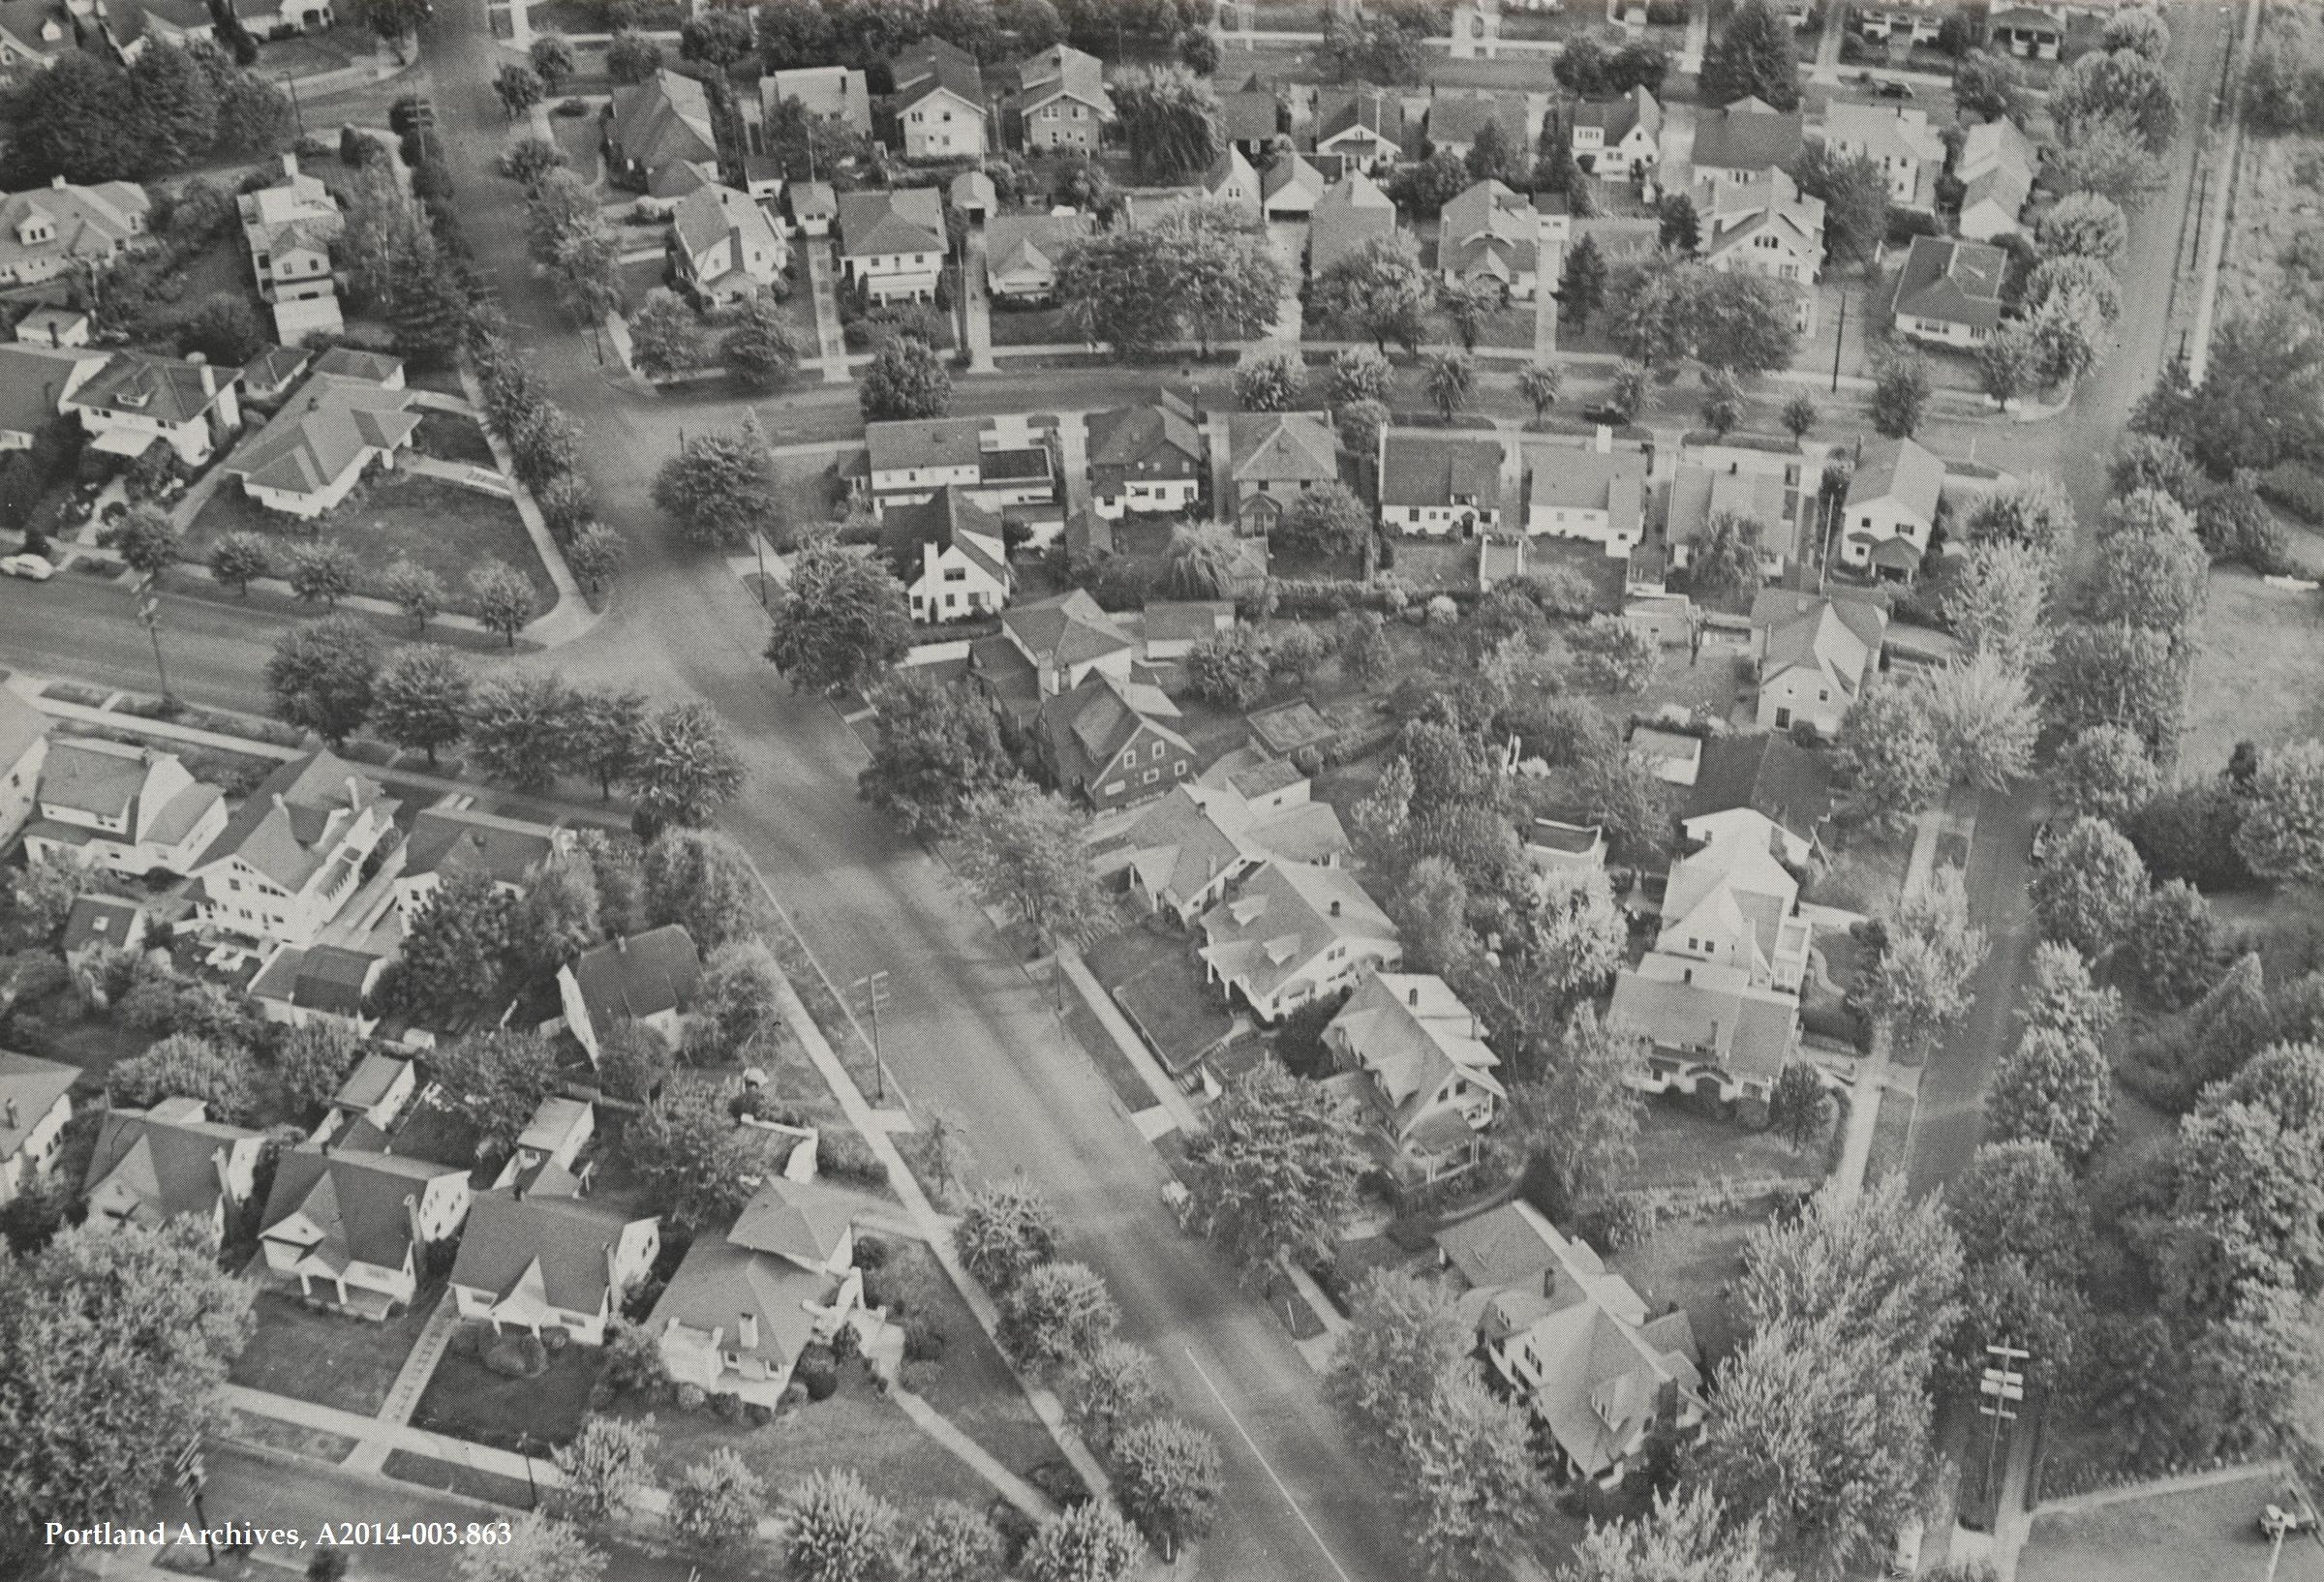 City of Portland Archives, Oregon, A2014-003.863